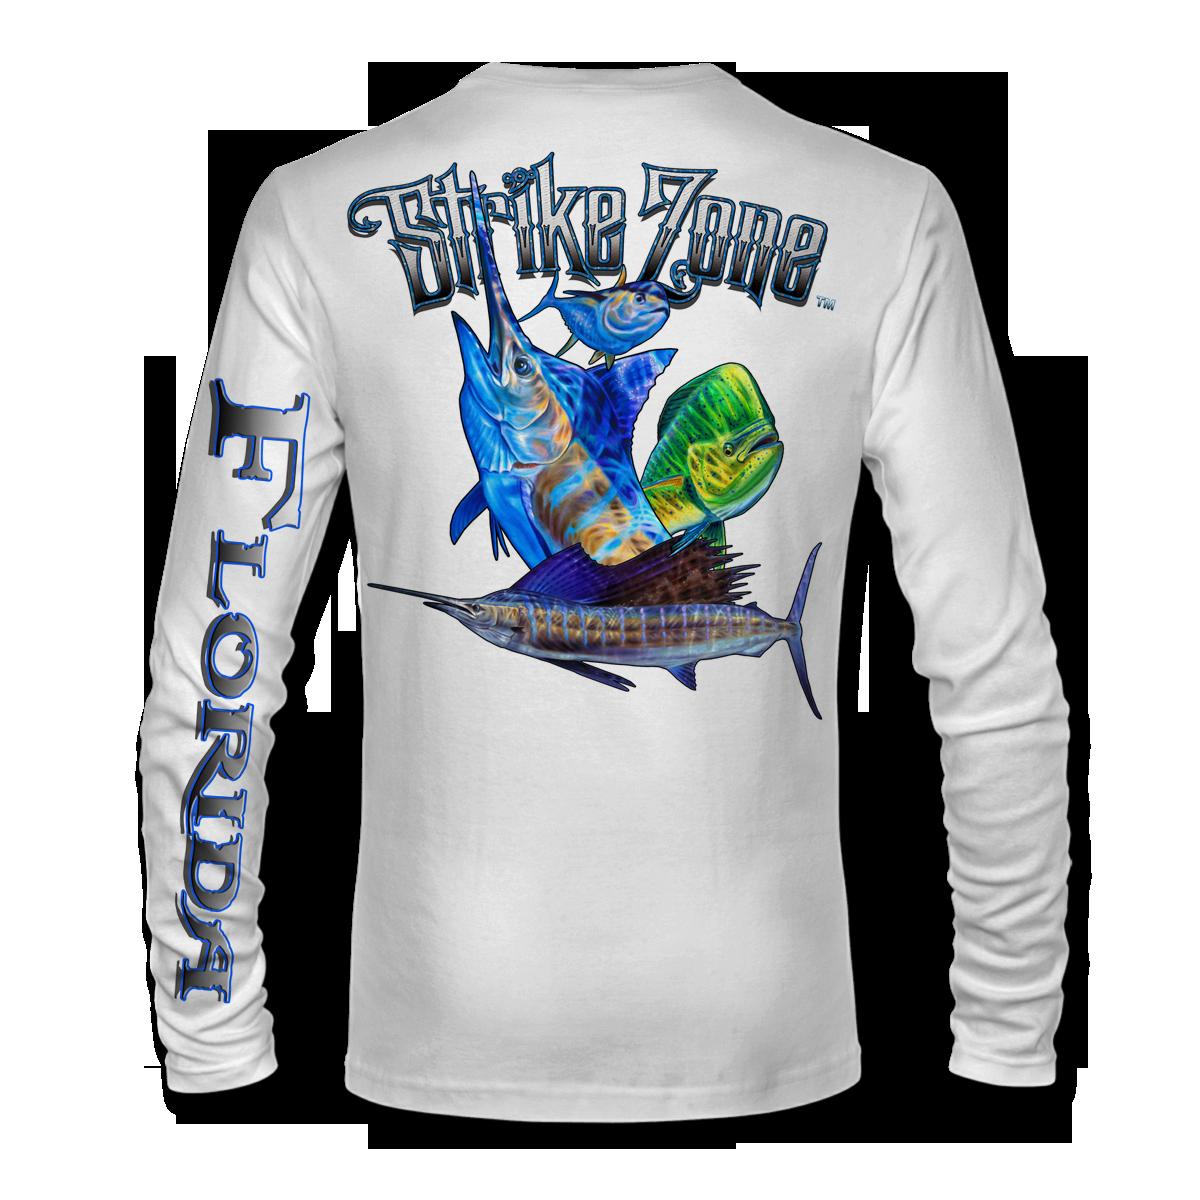 jason-mathias-strike-zone-offshore-slam-fishing-shirt-white-back.png